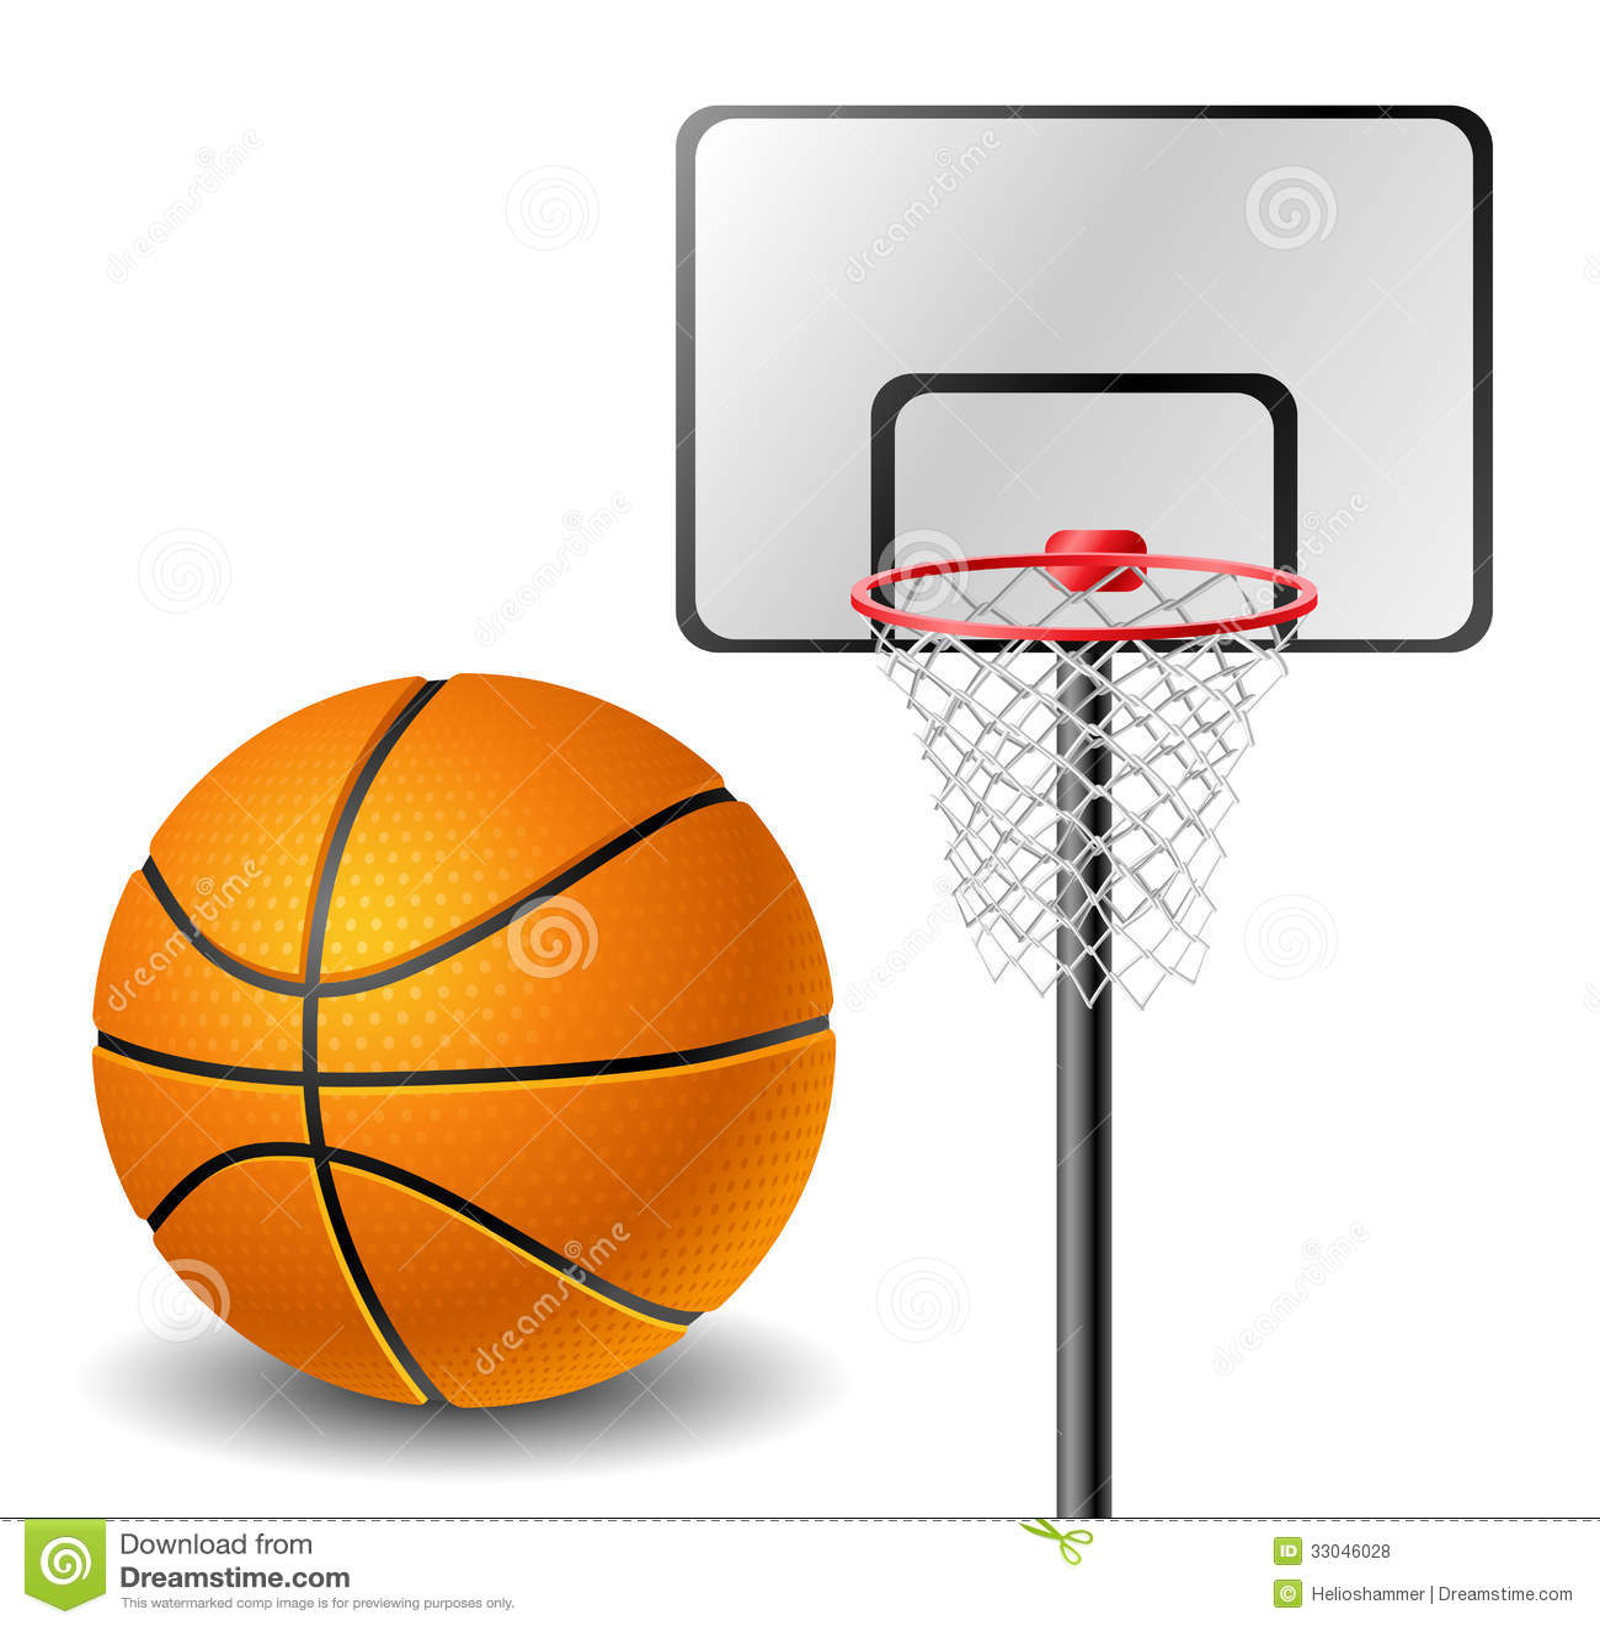 boule et panier de basket ball illustration stock illustration du loisirs ball 33046028. Black Bedroom Furniture Sets. Home Design Ideas